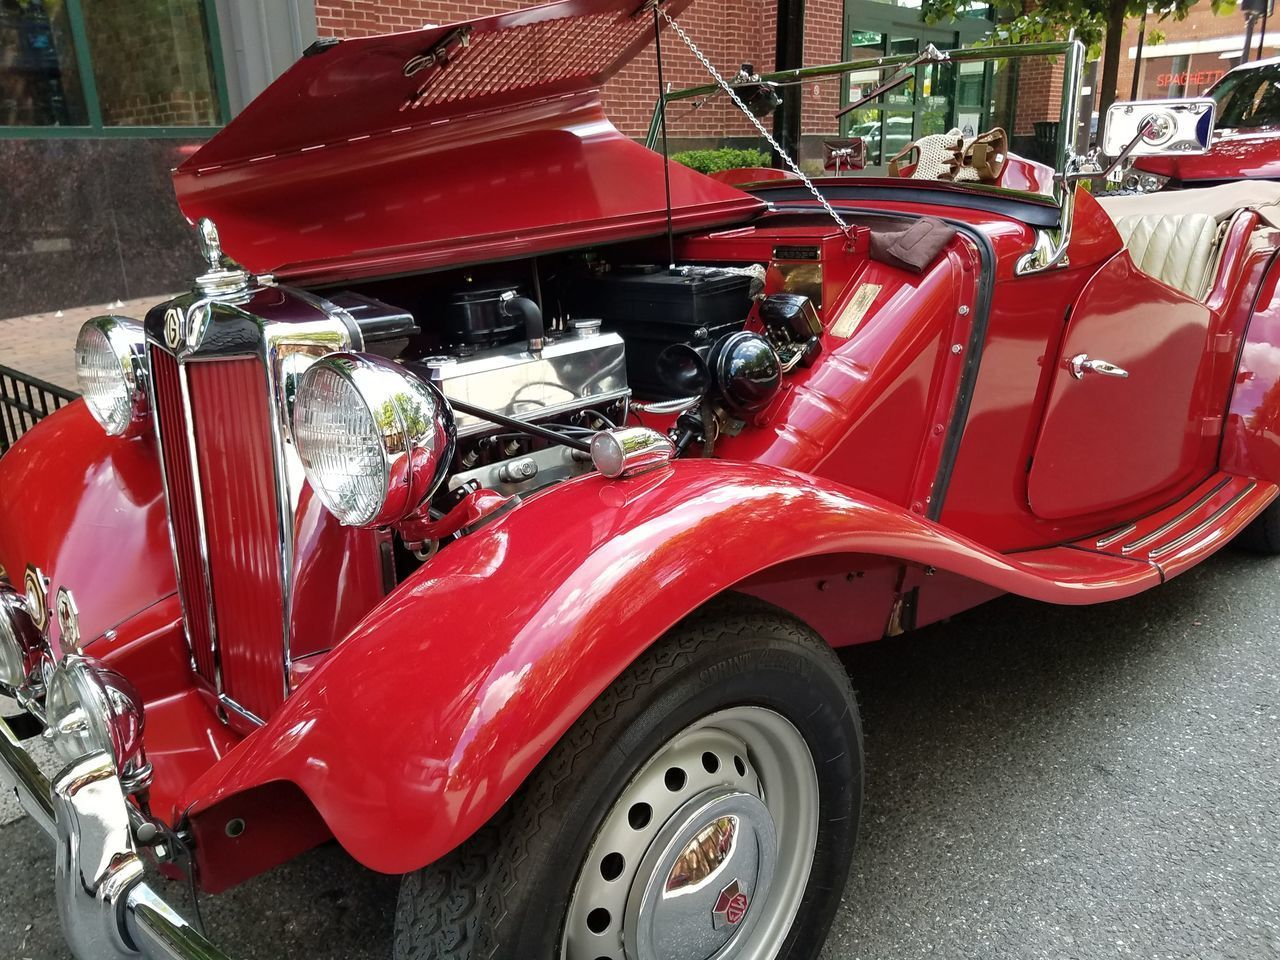 RED VINTAGE CAR ON STREET